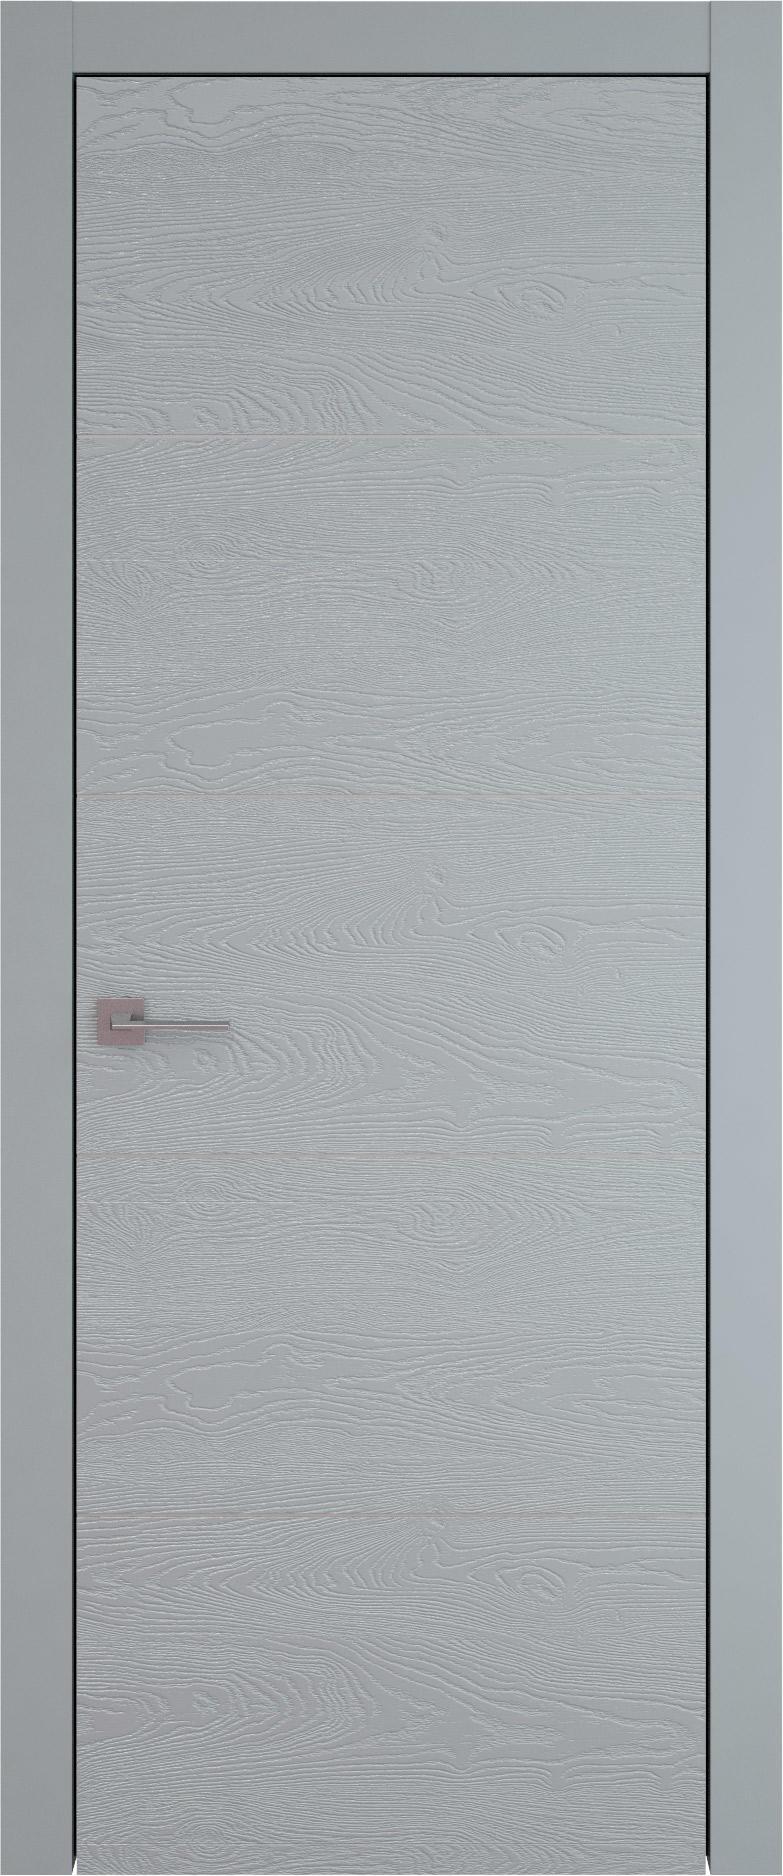 Tivoli Д-3 цвет - Серебристо-серая эмаль по шпону (RAL 7045) Без стекла (ДГ)